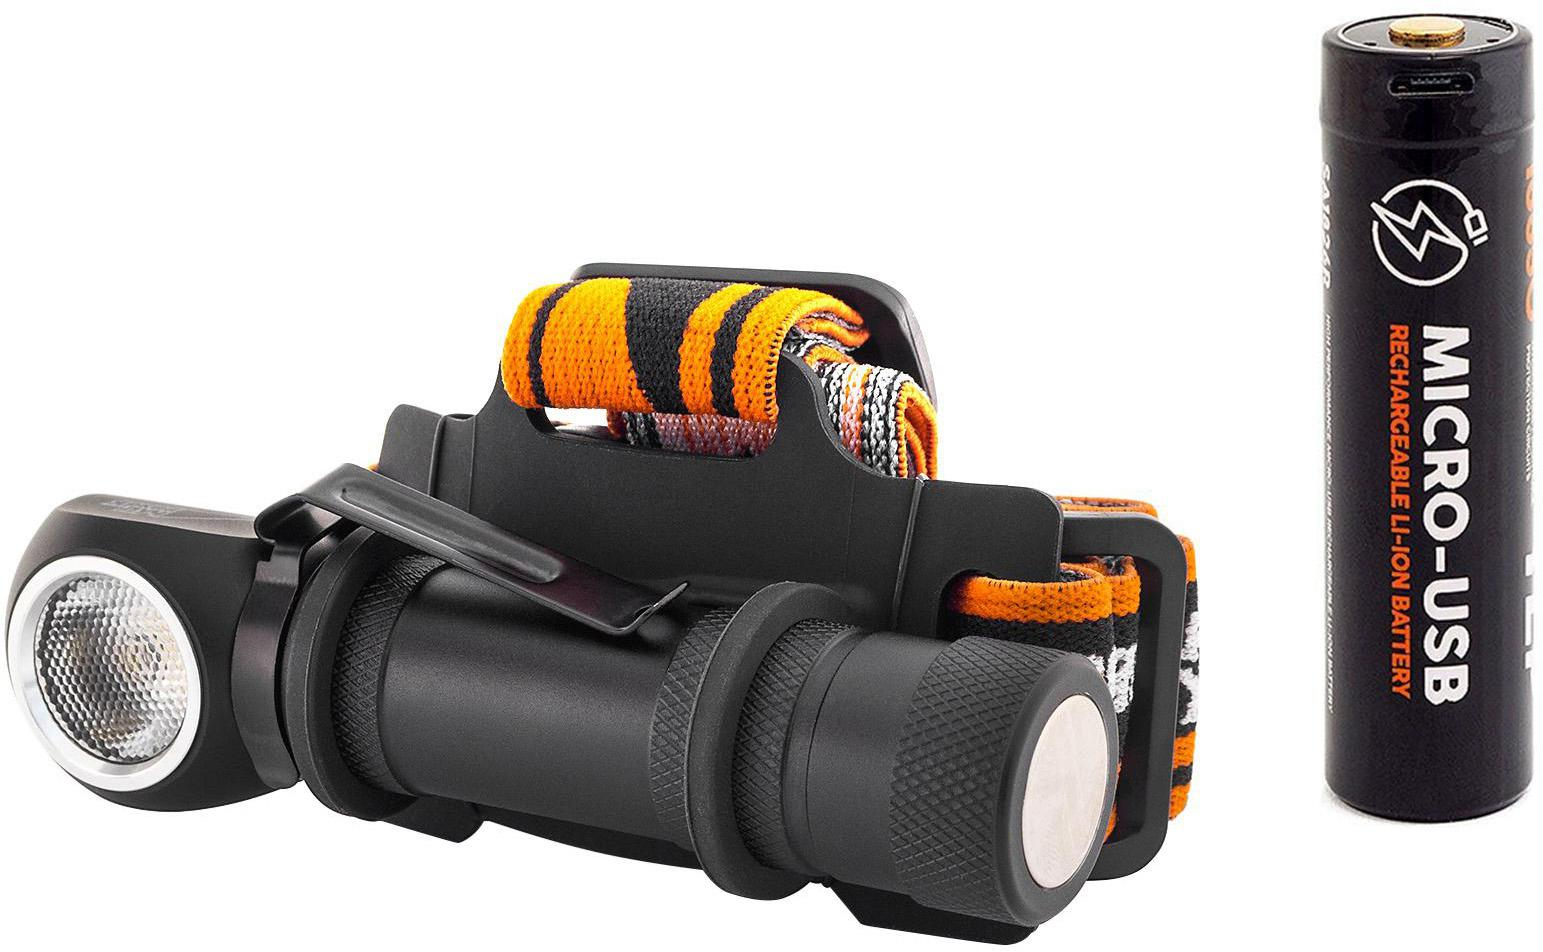 Набор ЯРКИЙ ЛУЧ Фонарь lh-500 enot +Аккумулятор ylp sa1826 аккумулятор яркий луч lg1833r 18650 li ion 3350mah 1шт блистер